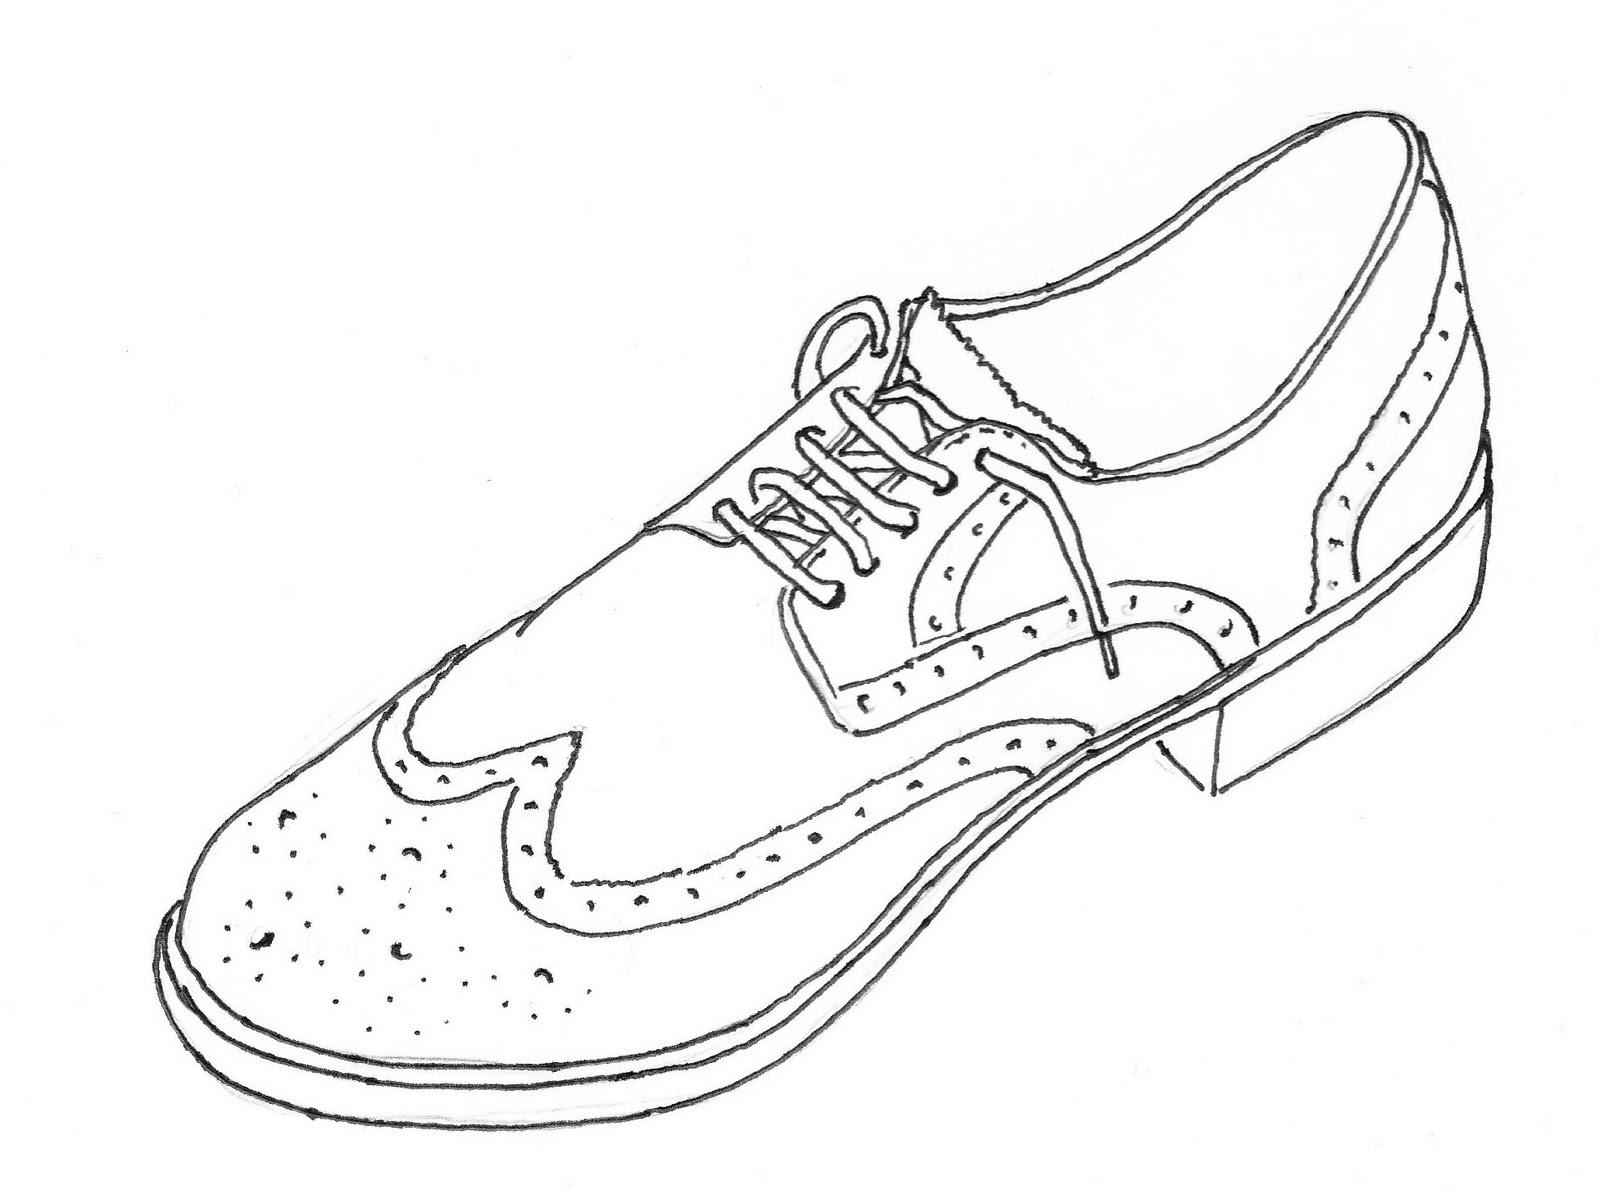 Drawn shoe sketched #1